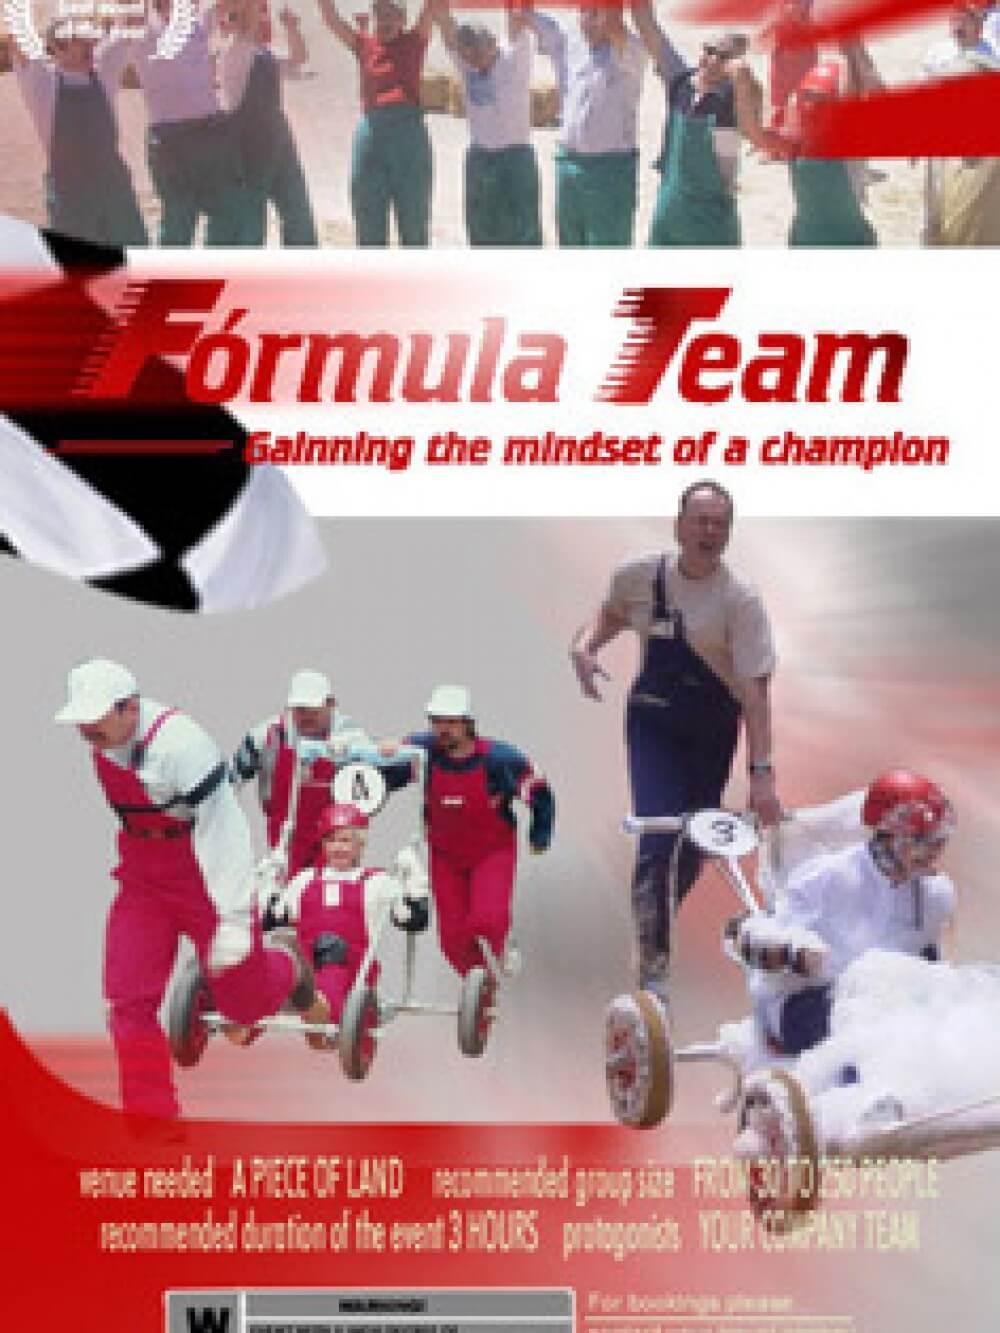 formula_team_vertical_web